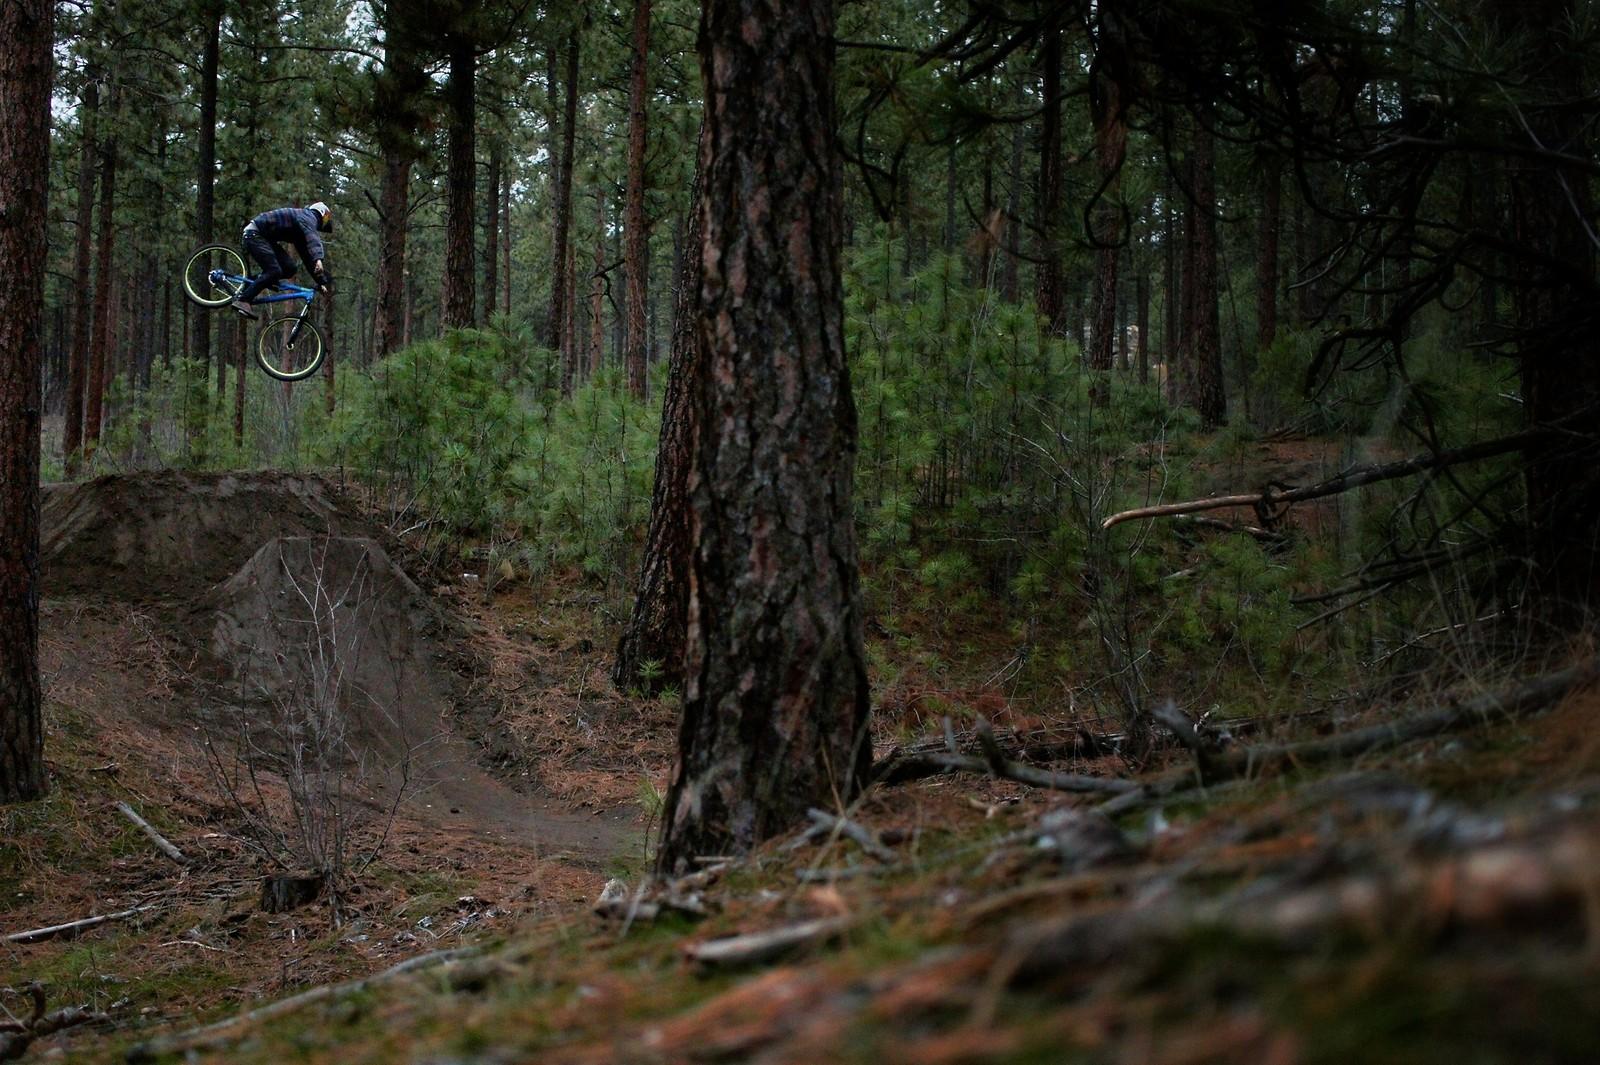 Justin Bumgarner spinning - Skye_Schillhammer - Mountain Biking Pictures - Vital MTB